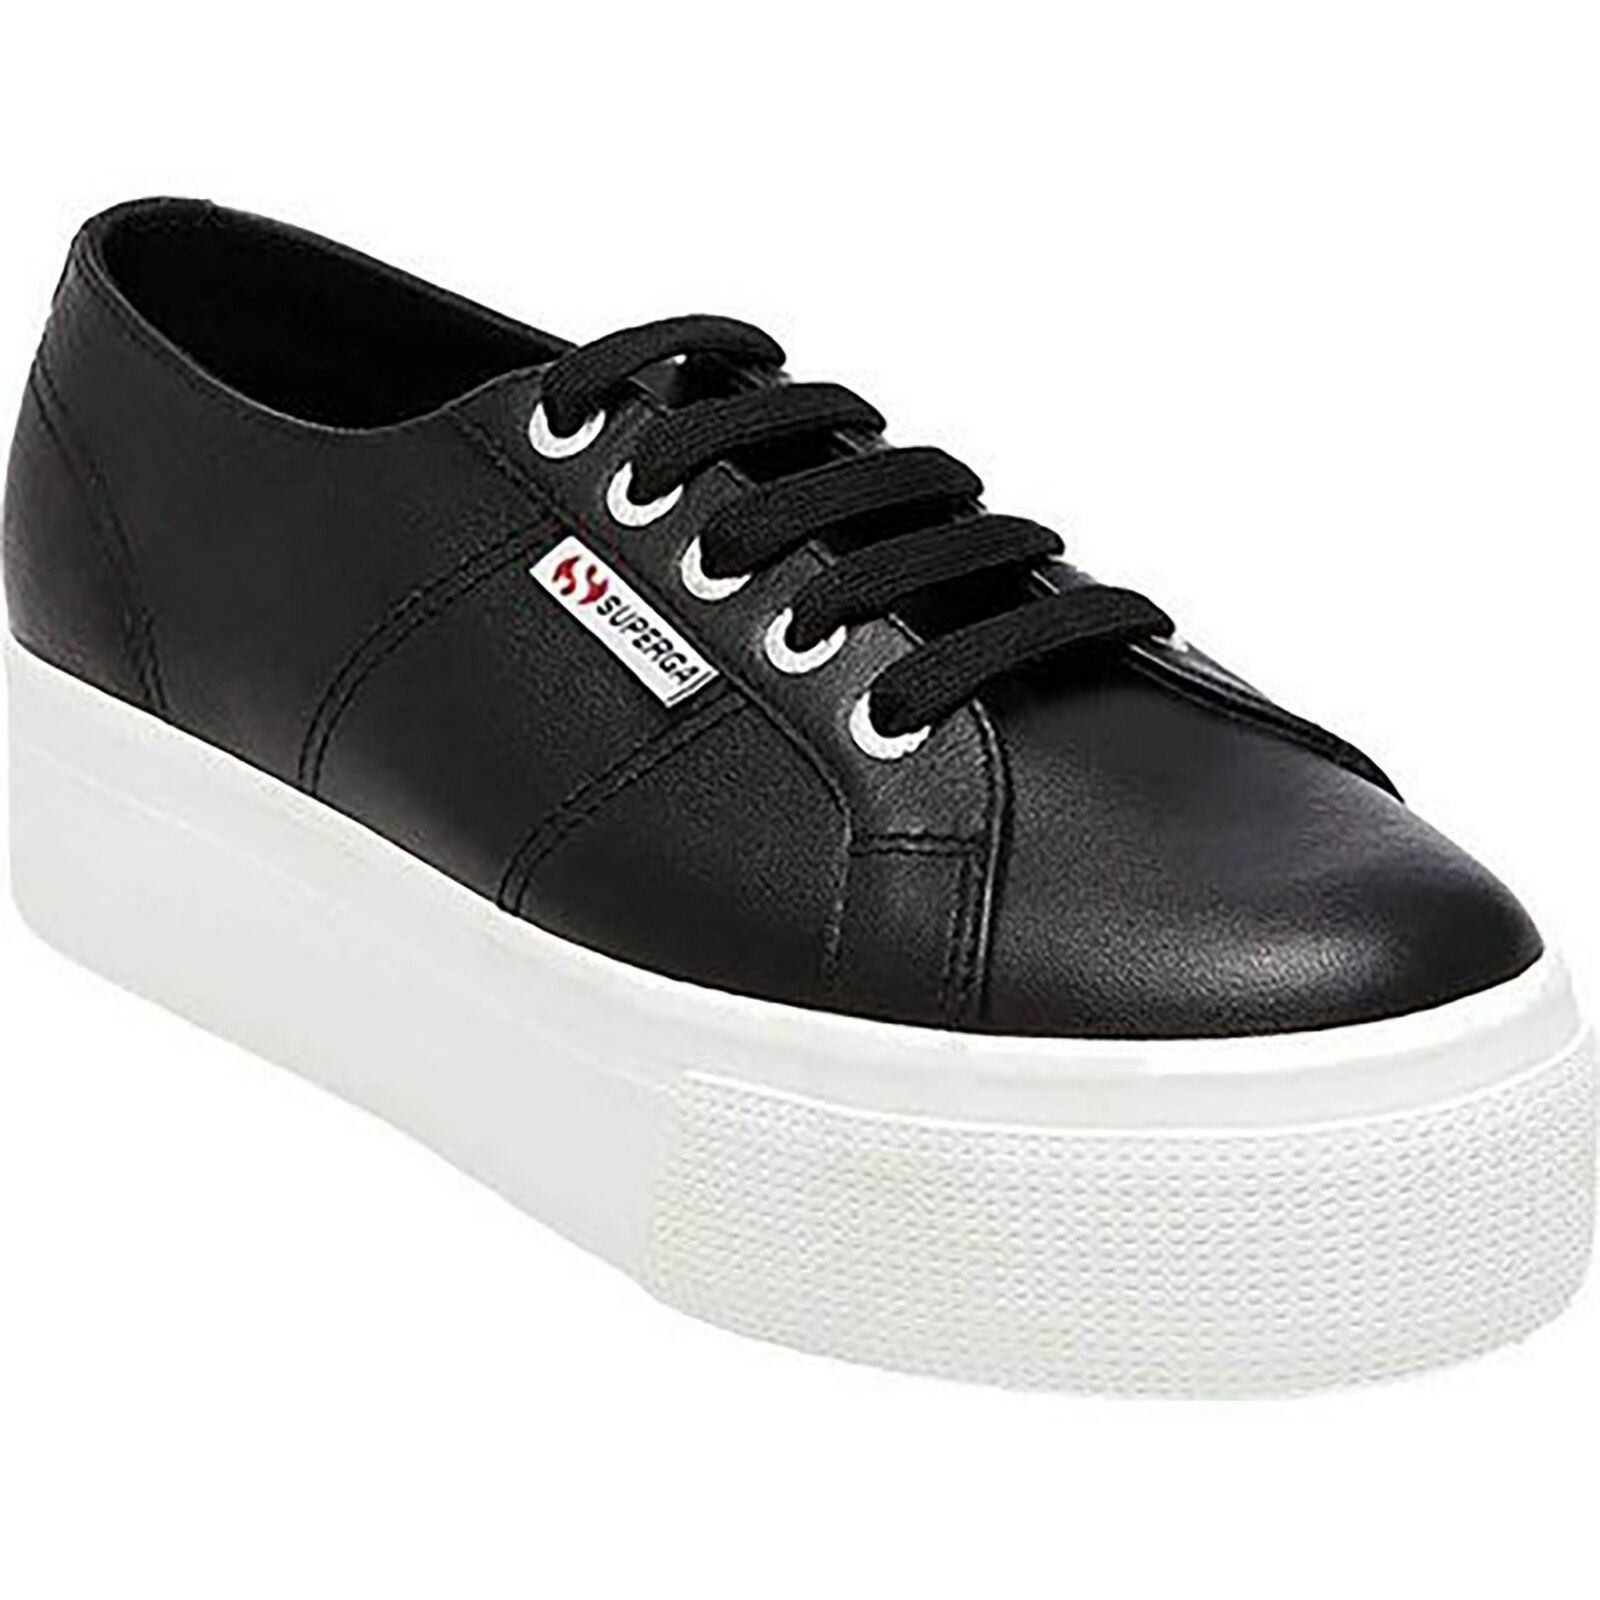 Superga Women's 2790 Black Leather Platform Fashion Sneaker Size US 10